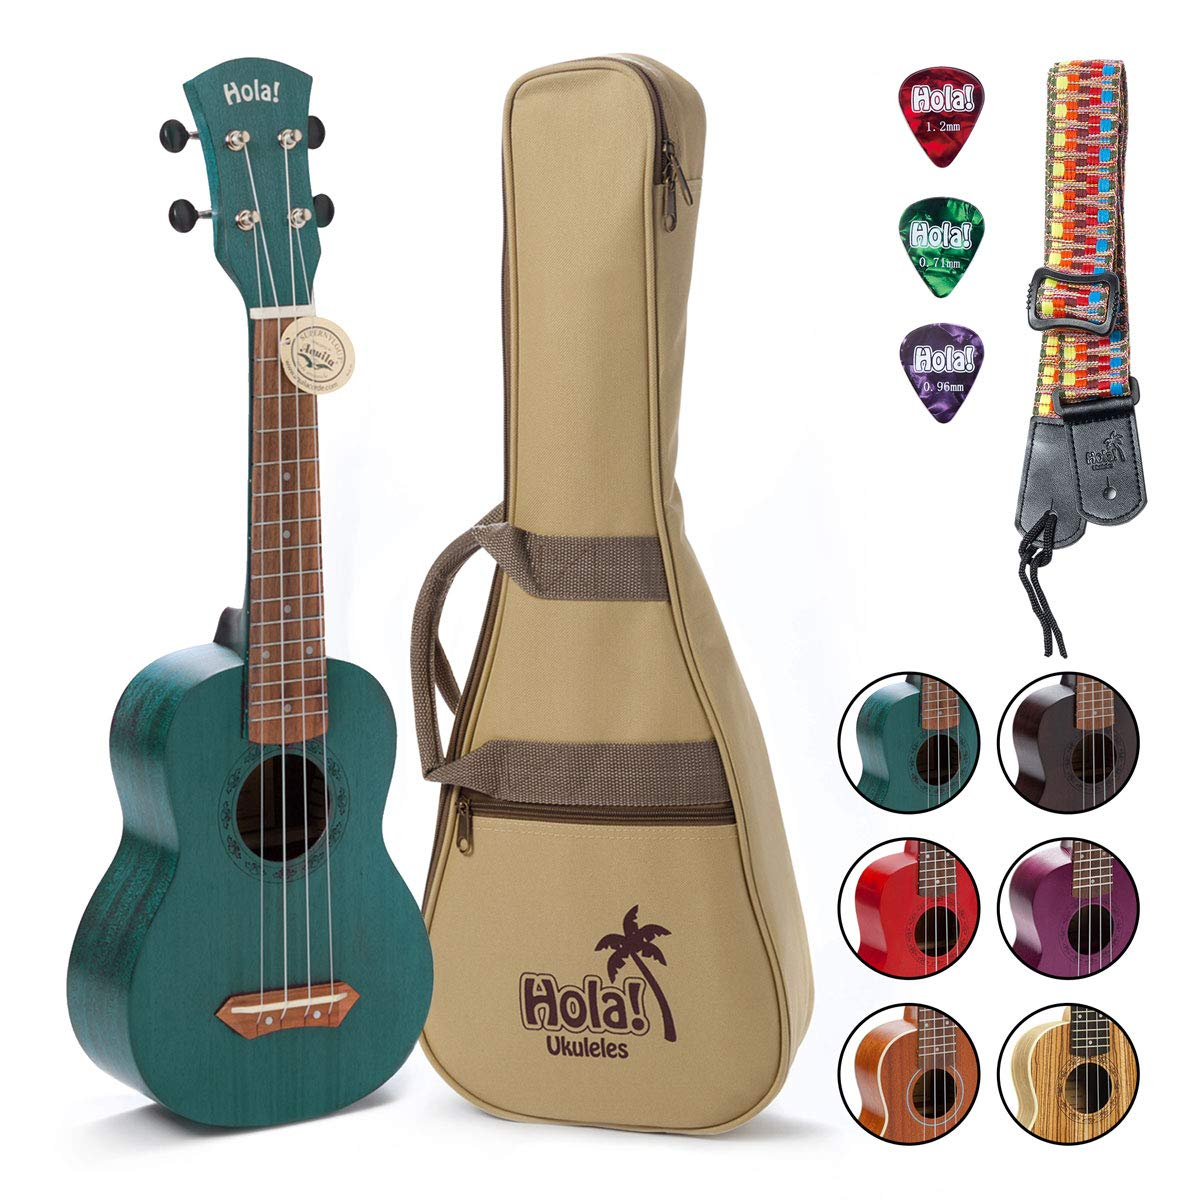 Hola! Music HM-121BU+ Deluxe Mahogany Soprano Ukulele Bundle with Aquila Strings, Padded Gig Bag, Strap and Picks - Teal by Hola! Music